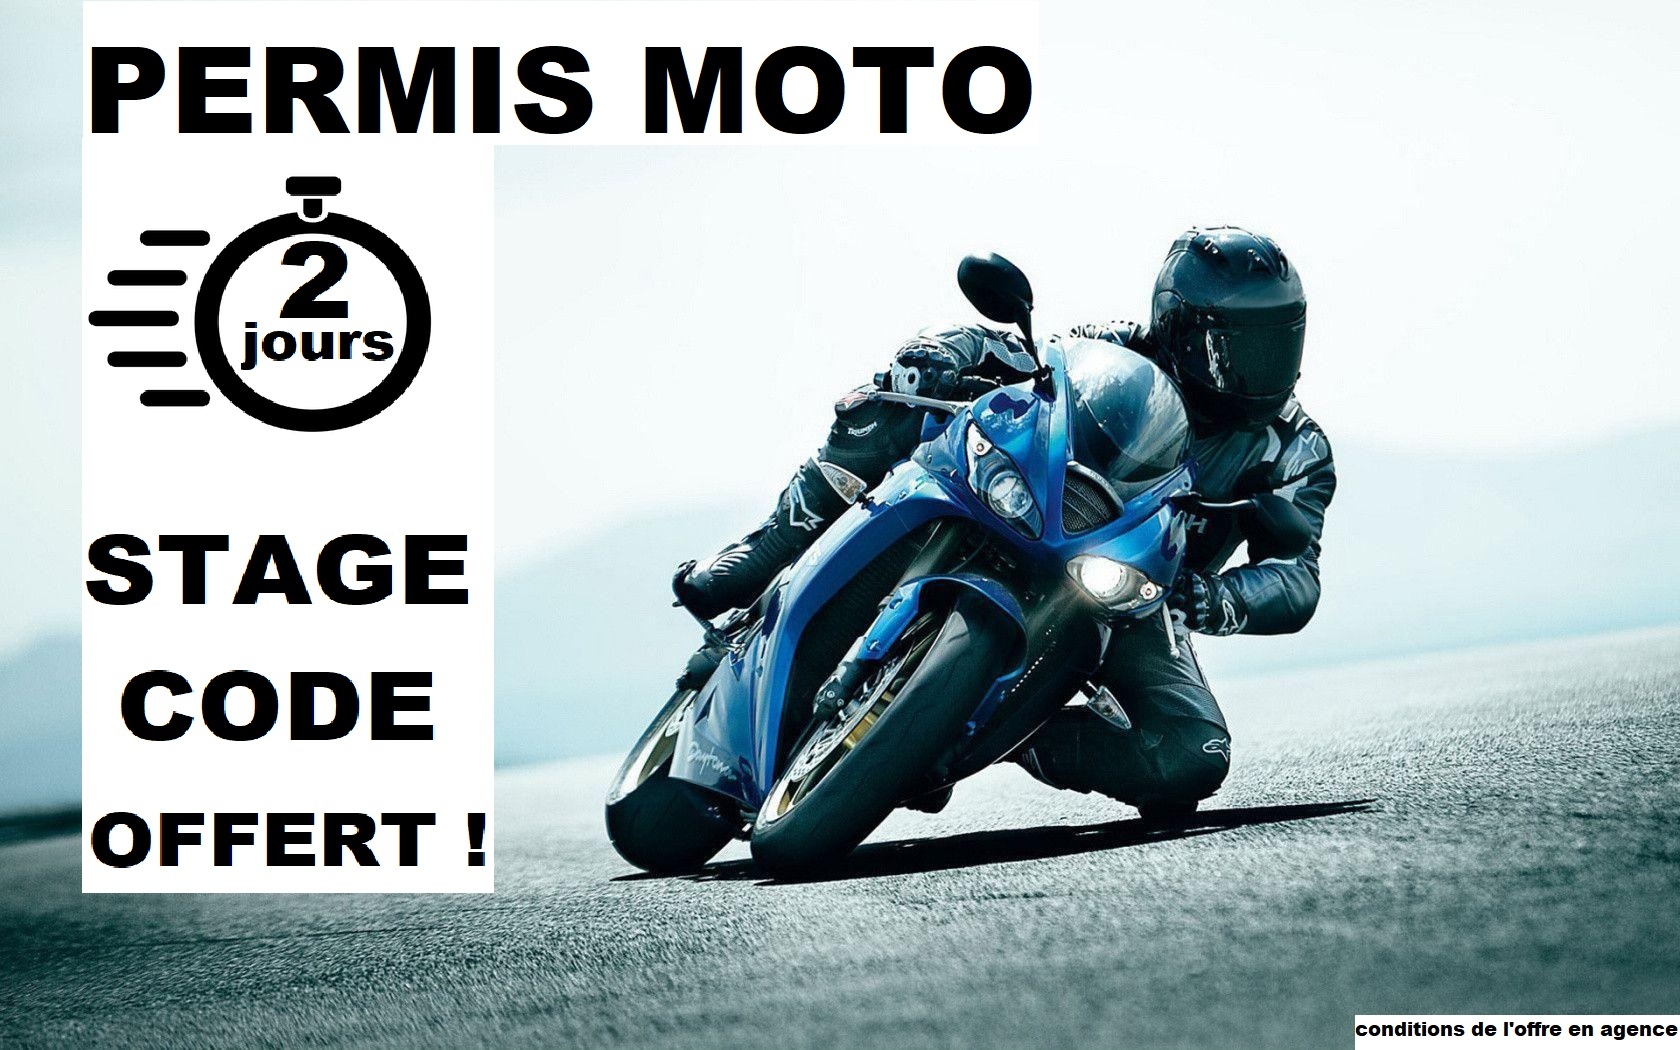 Permis Moto : STAGE CODE OFFERT